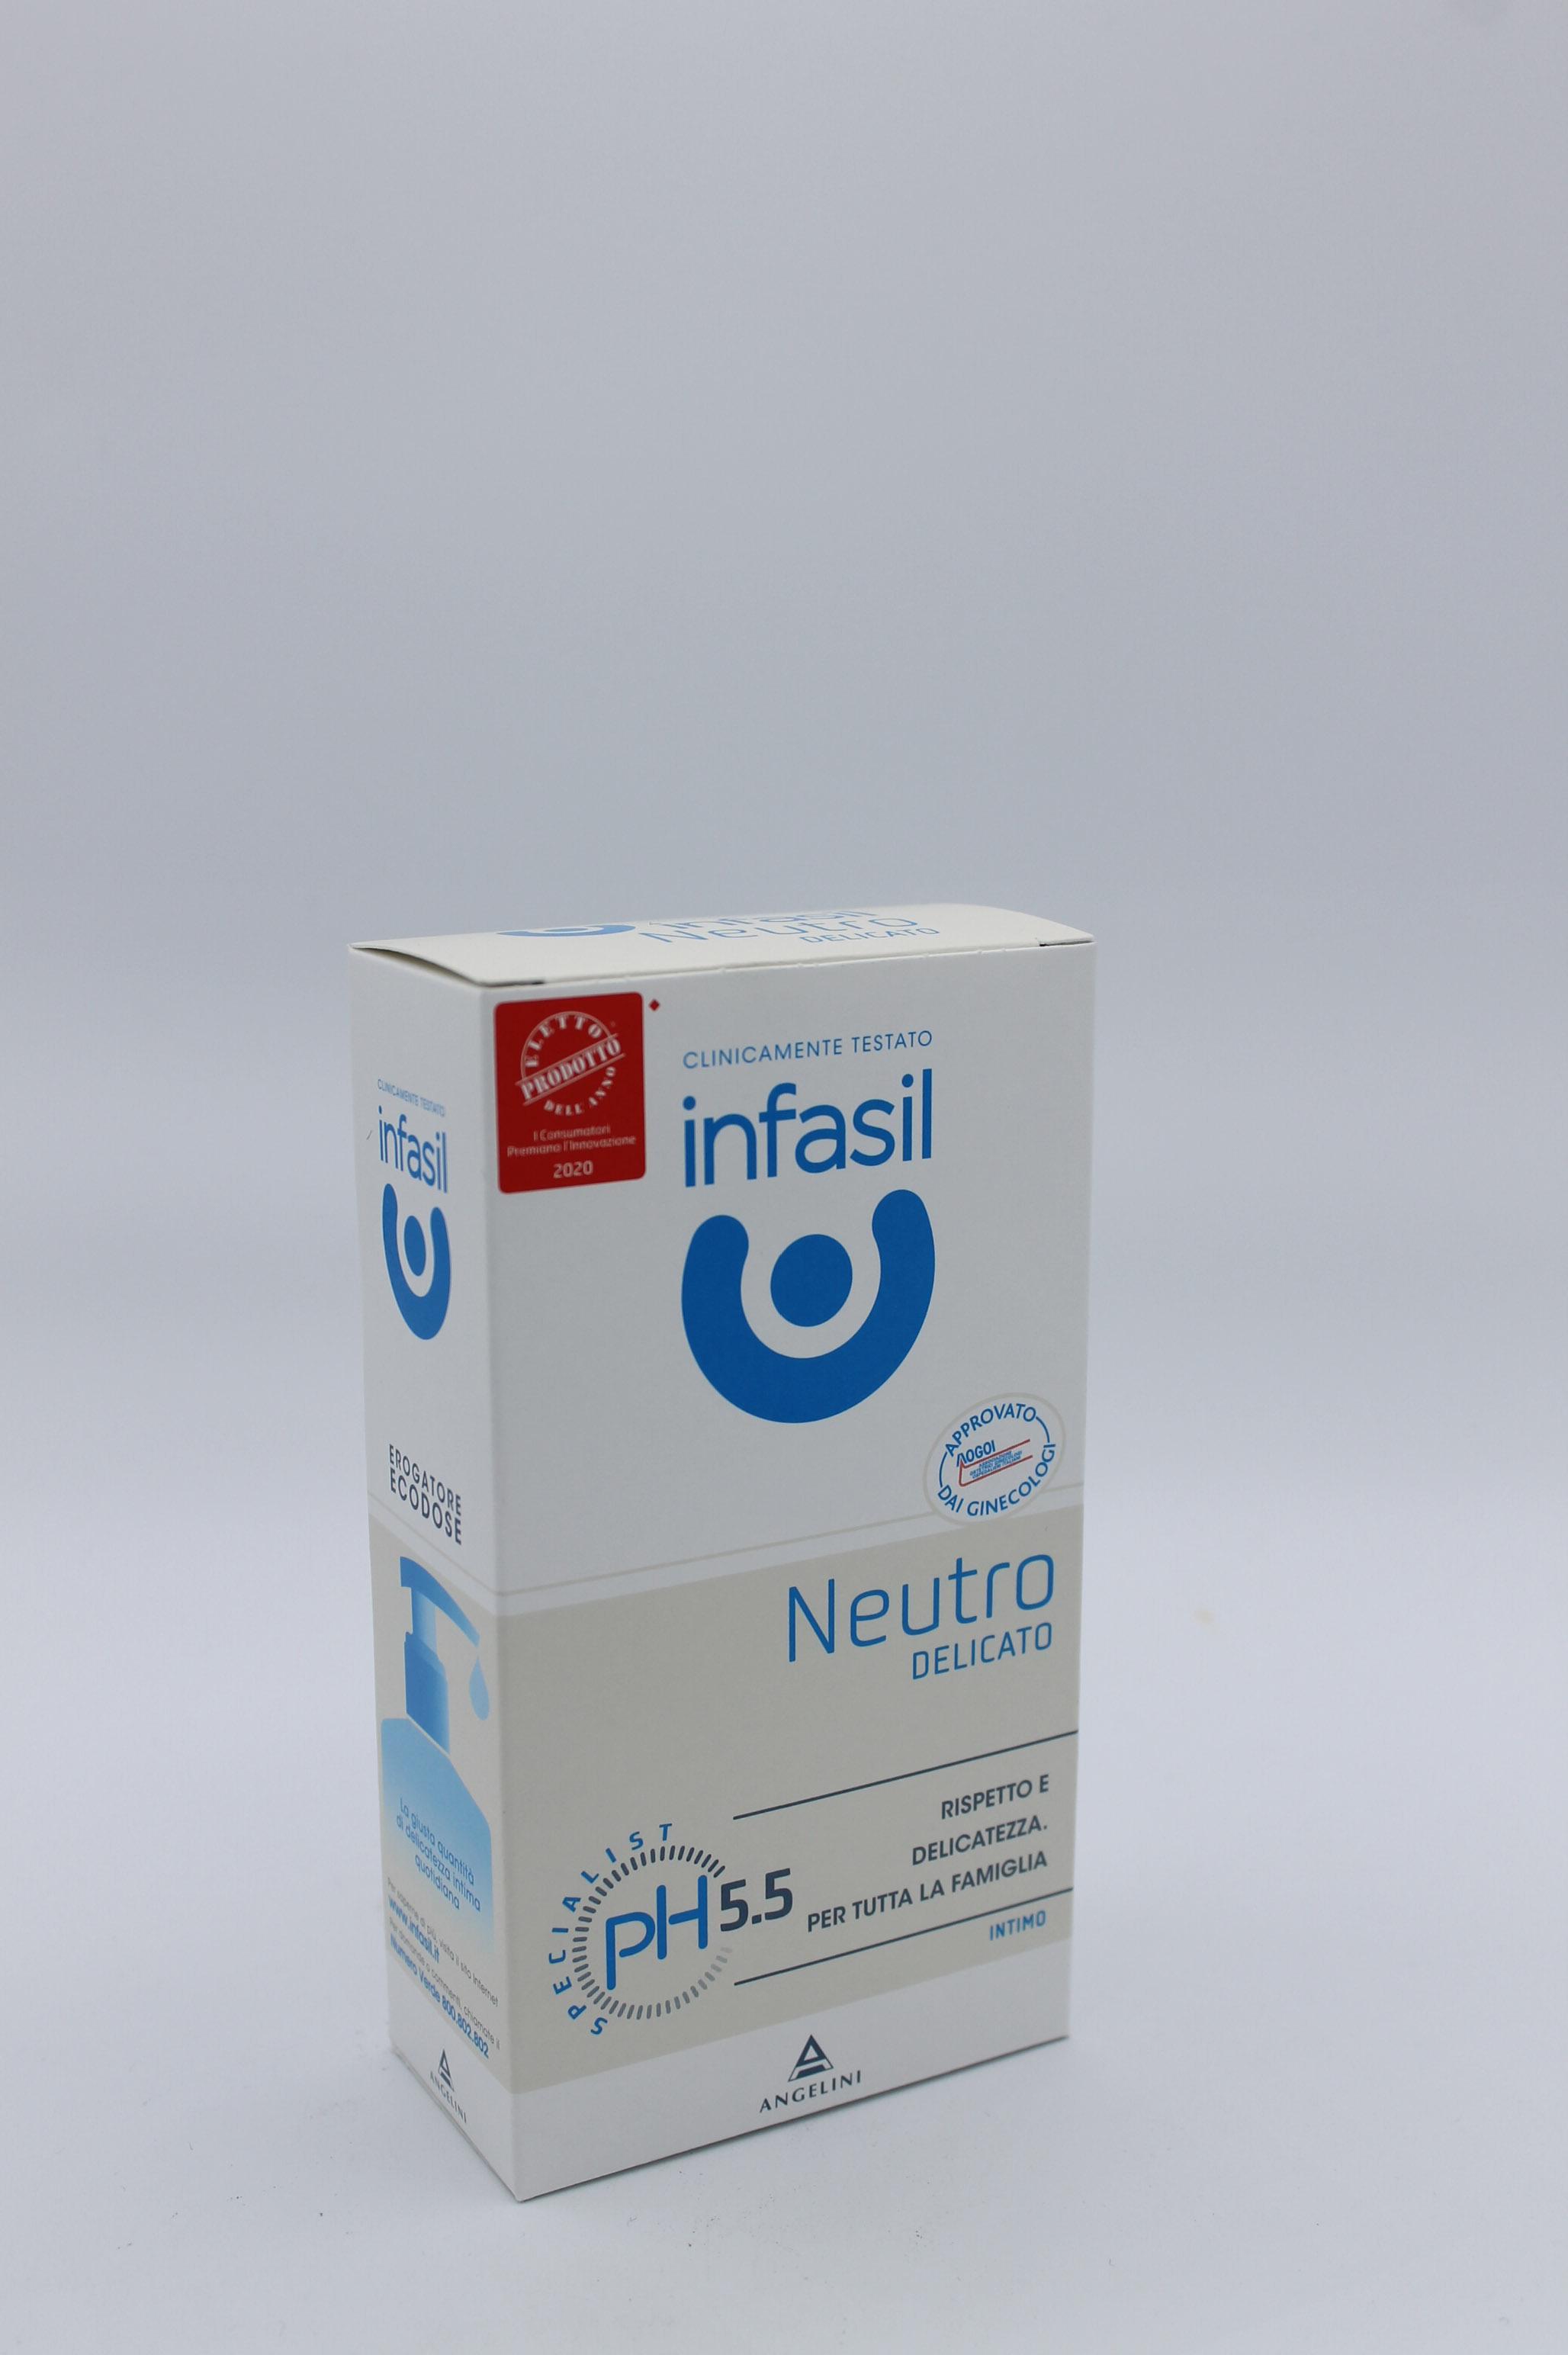 Infasil detergente intimo neutro 200ml.